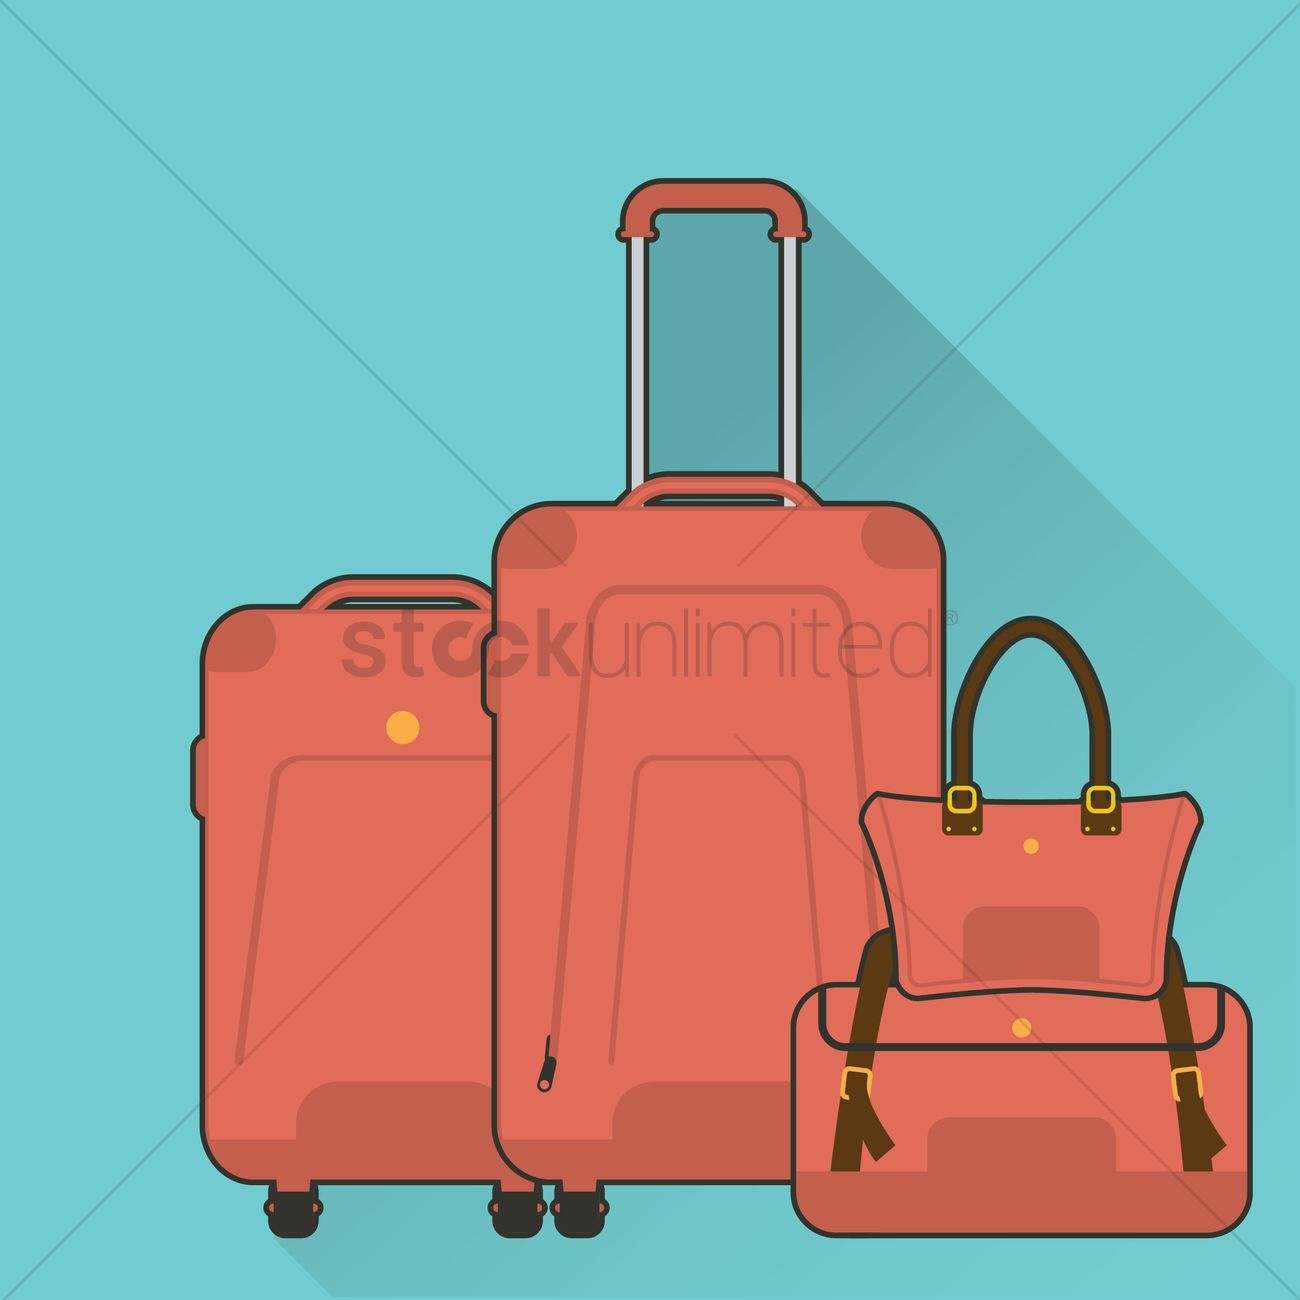 free modern luggage vector image    stockunlimited - free modern luggage vector graphic